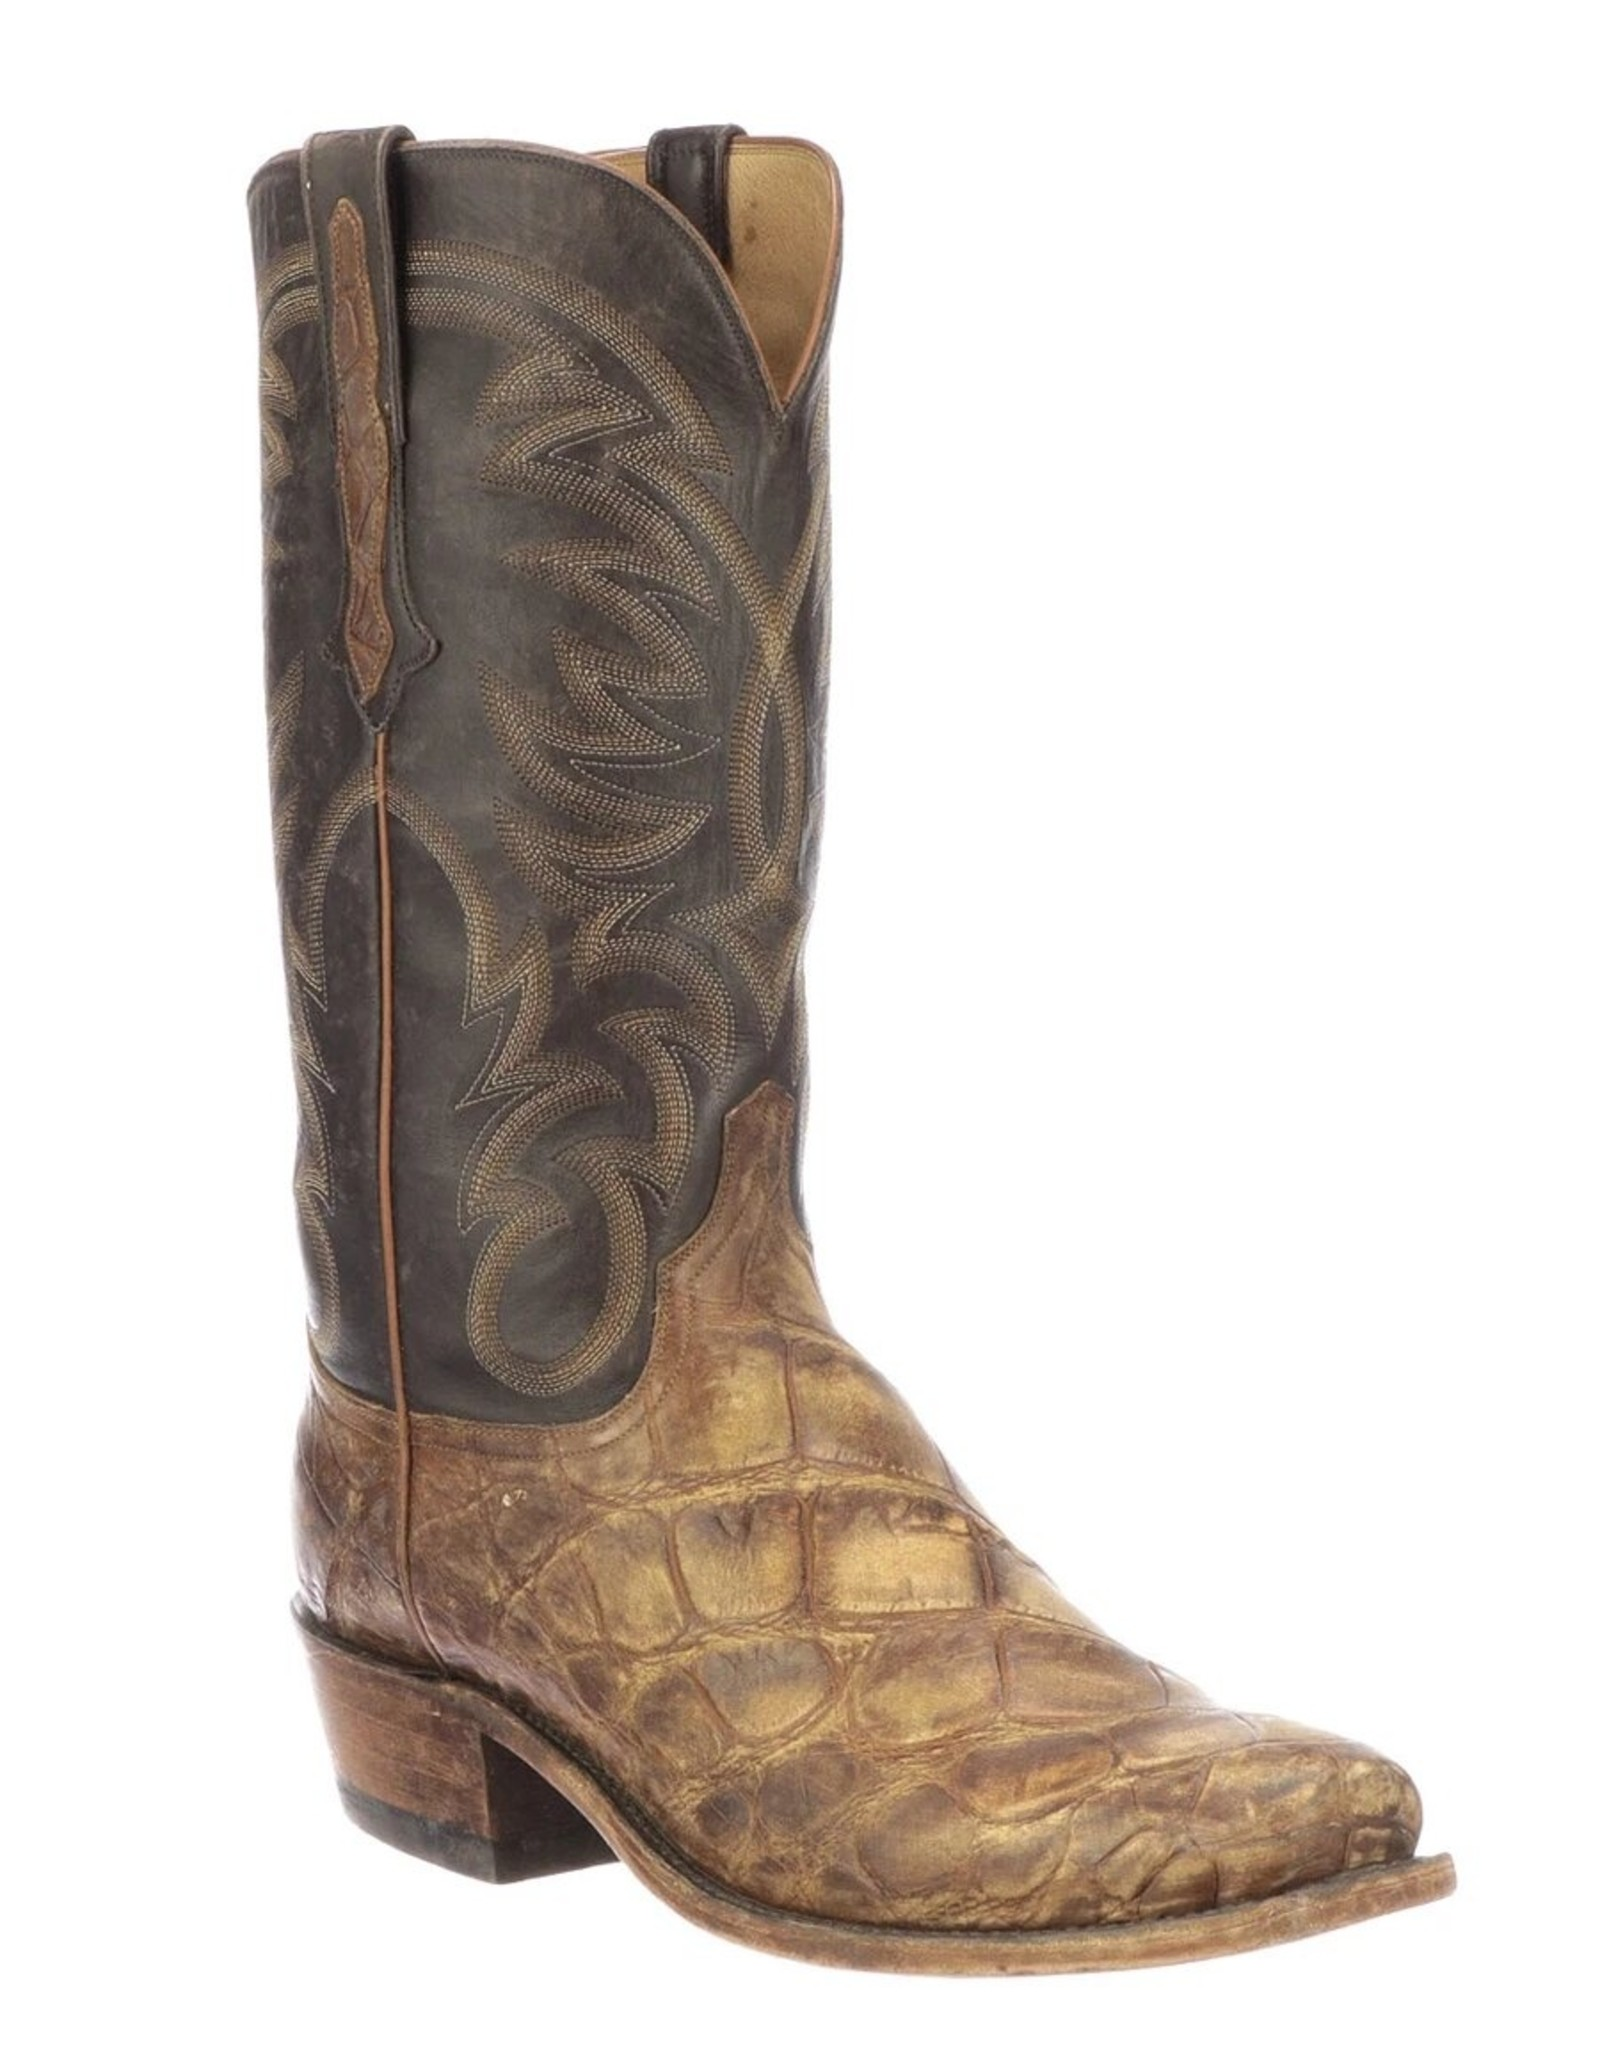 Boots-Men LUCCHESE Rodney N1197.73